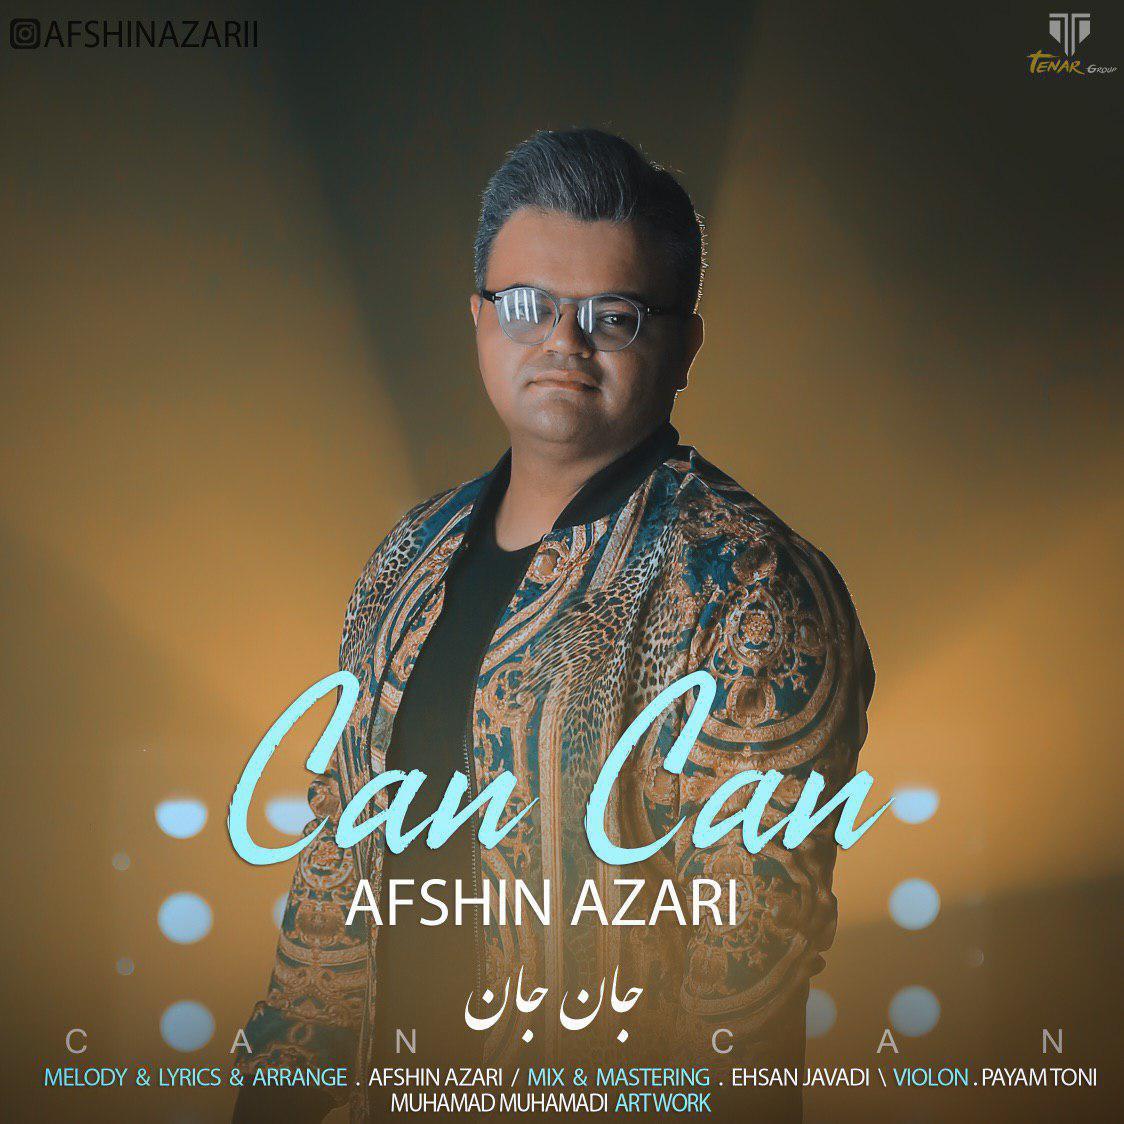 http://s5.picofile.com/file/8374872142/01Afshin_Azari_Can_Can.jpg